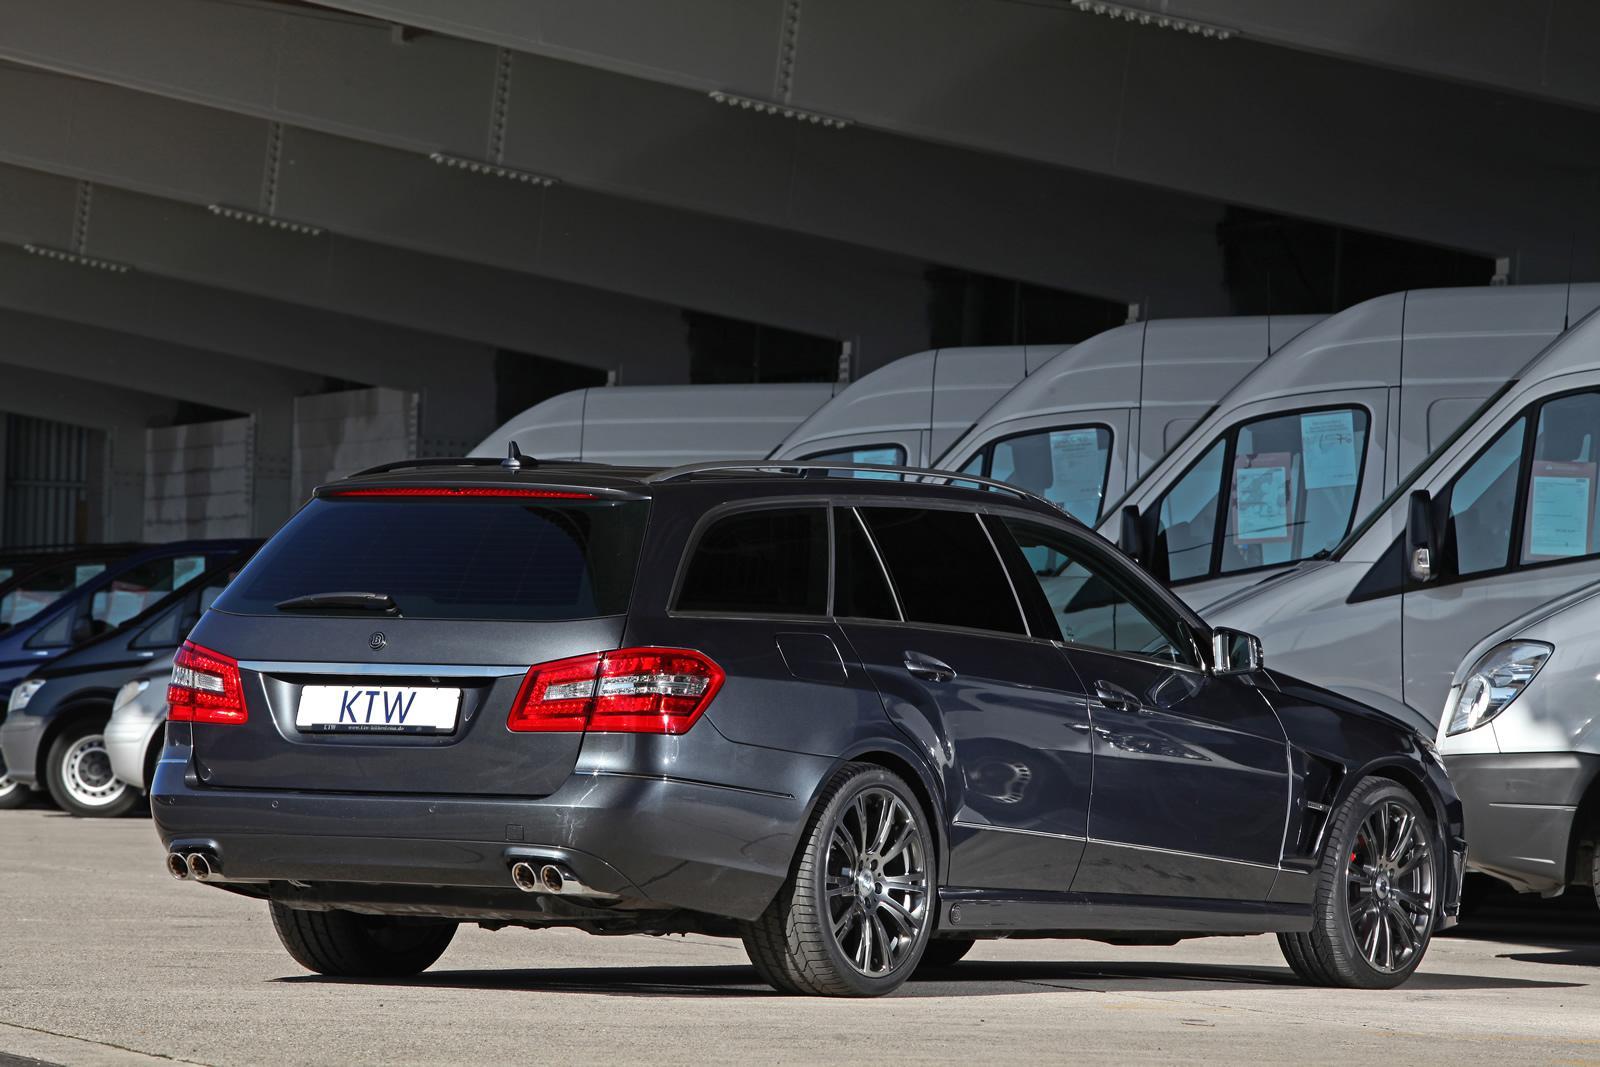 Mercedes E Class Wagon Gets Ktw Brabus Upgrade Autoevolution